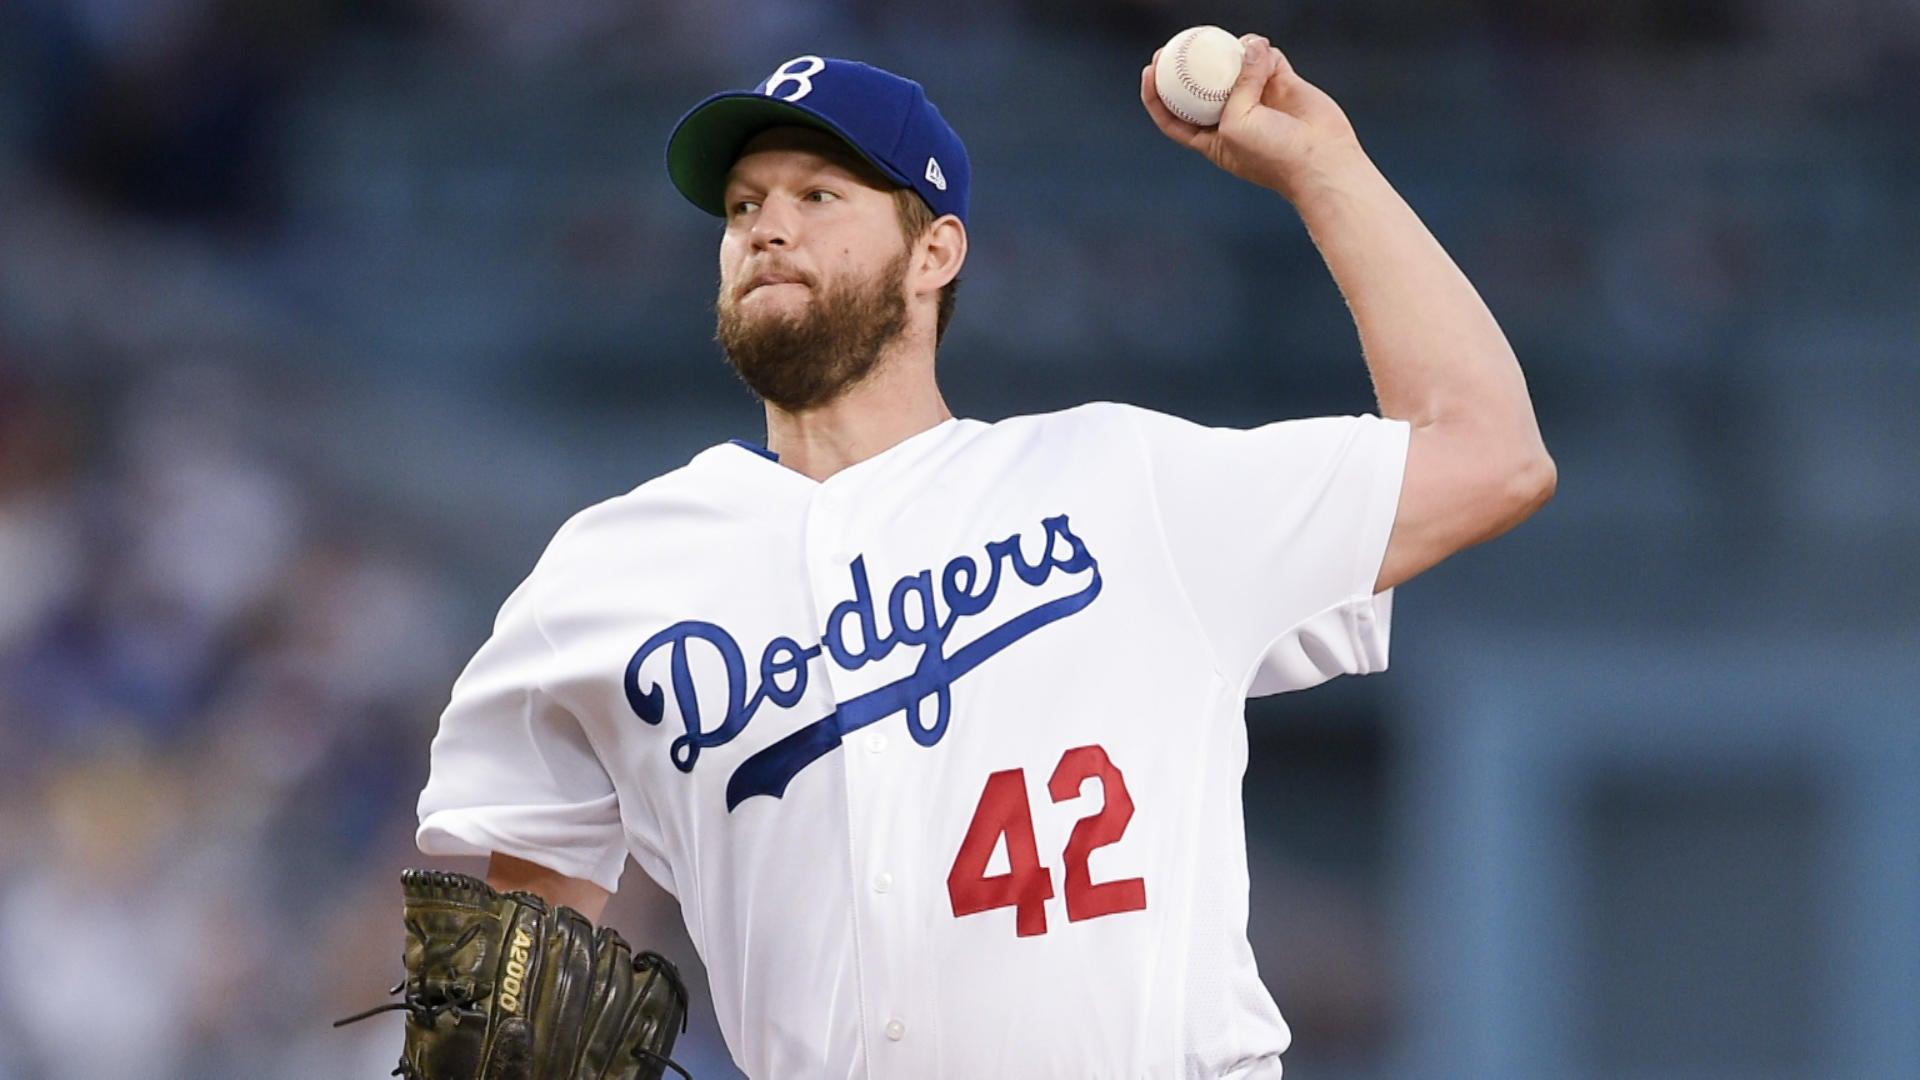 Fantasy Baseball Today Podcast: Kershaw's return, struggling stars like Kris Bryant, early trends